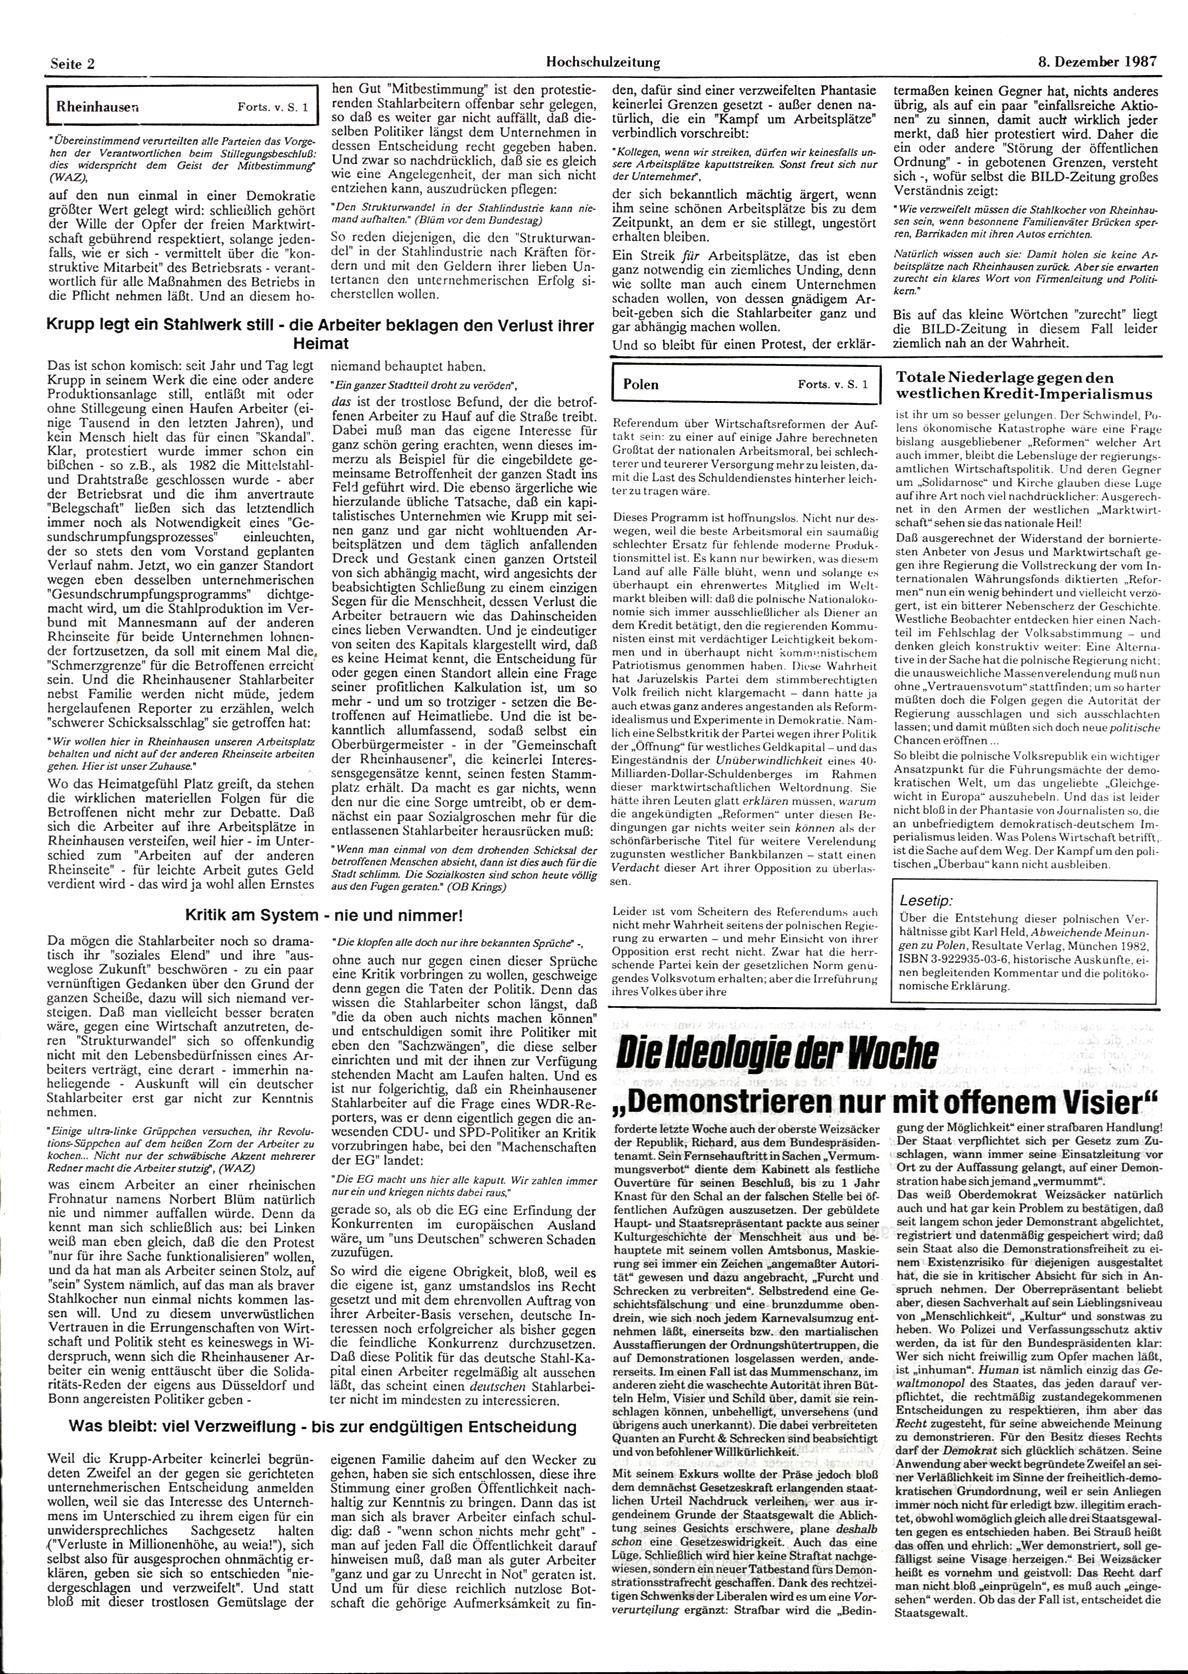 Bochum_BHZ_19871208_161_002